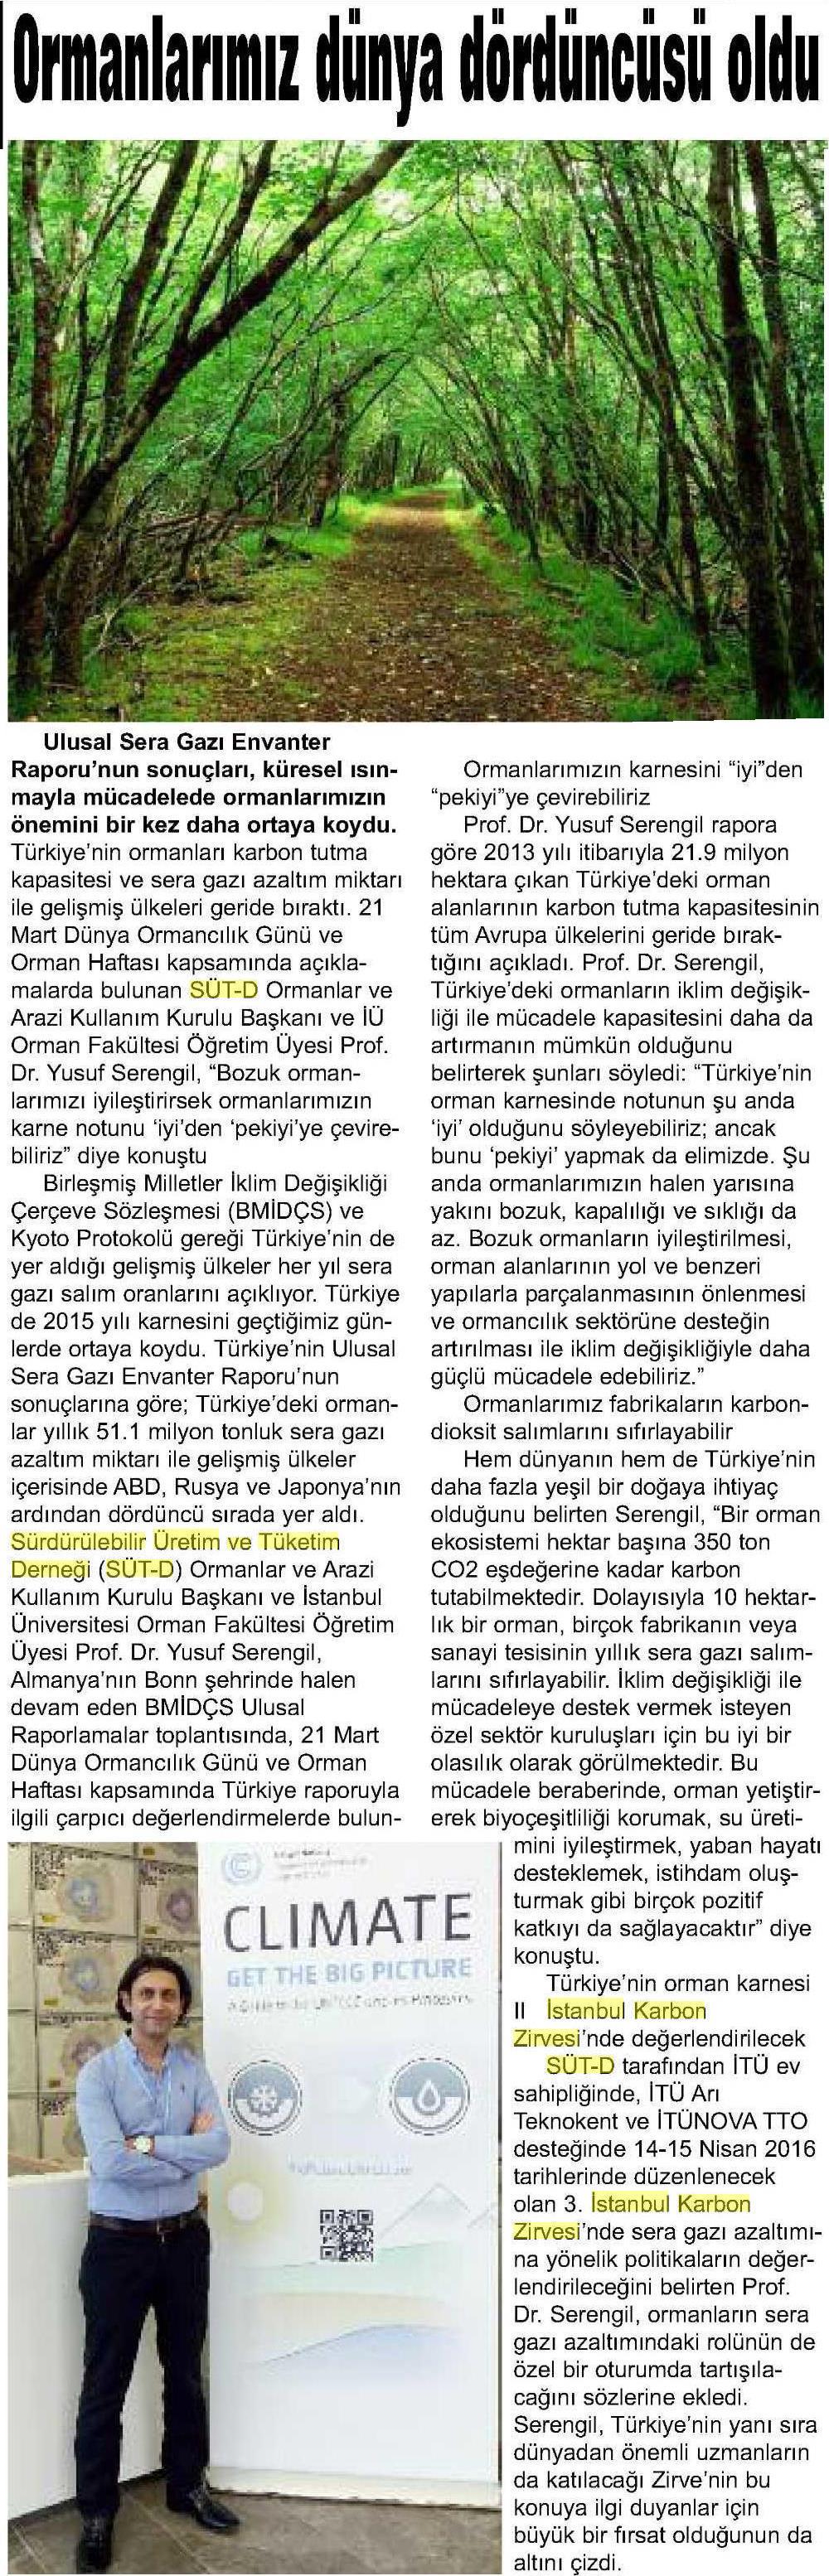 Objektif Gazetesi Amasya 21.03.2016